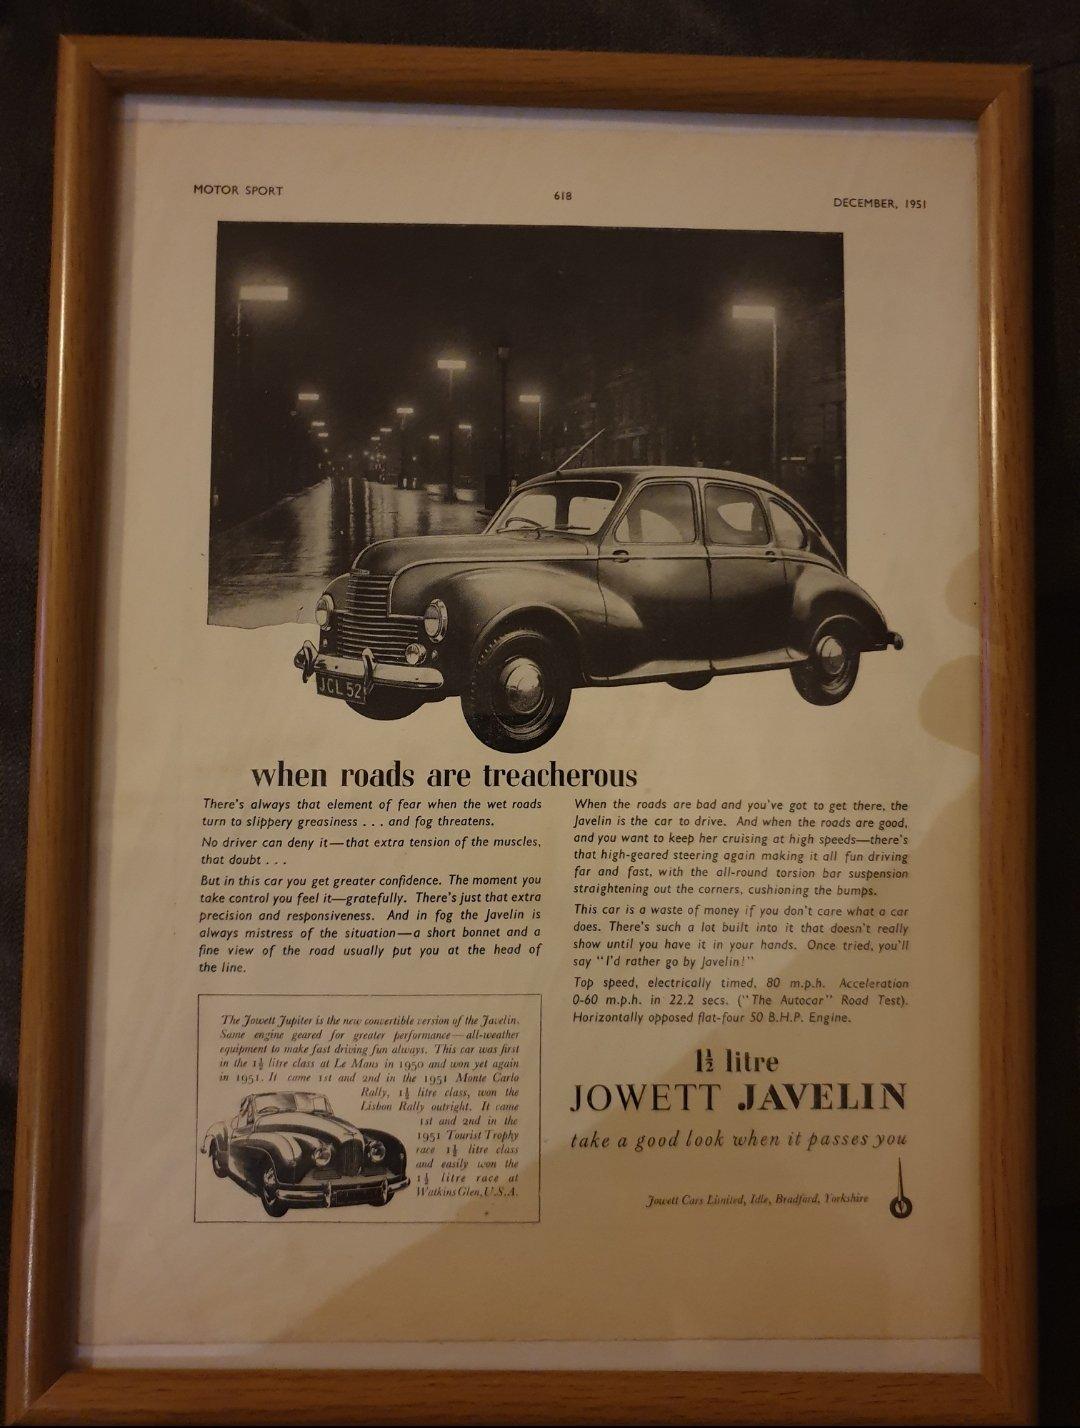 1951 Jowett Javelin Advert Original  For Sale (picture 1 of 2)